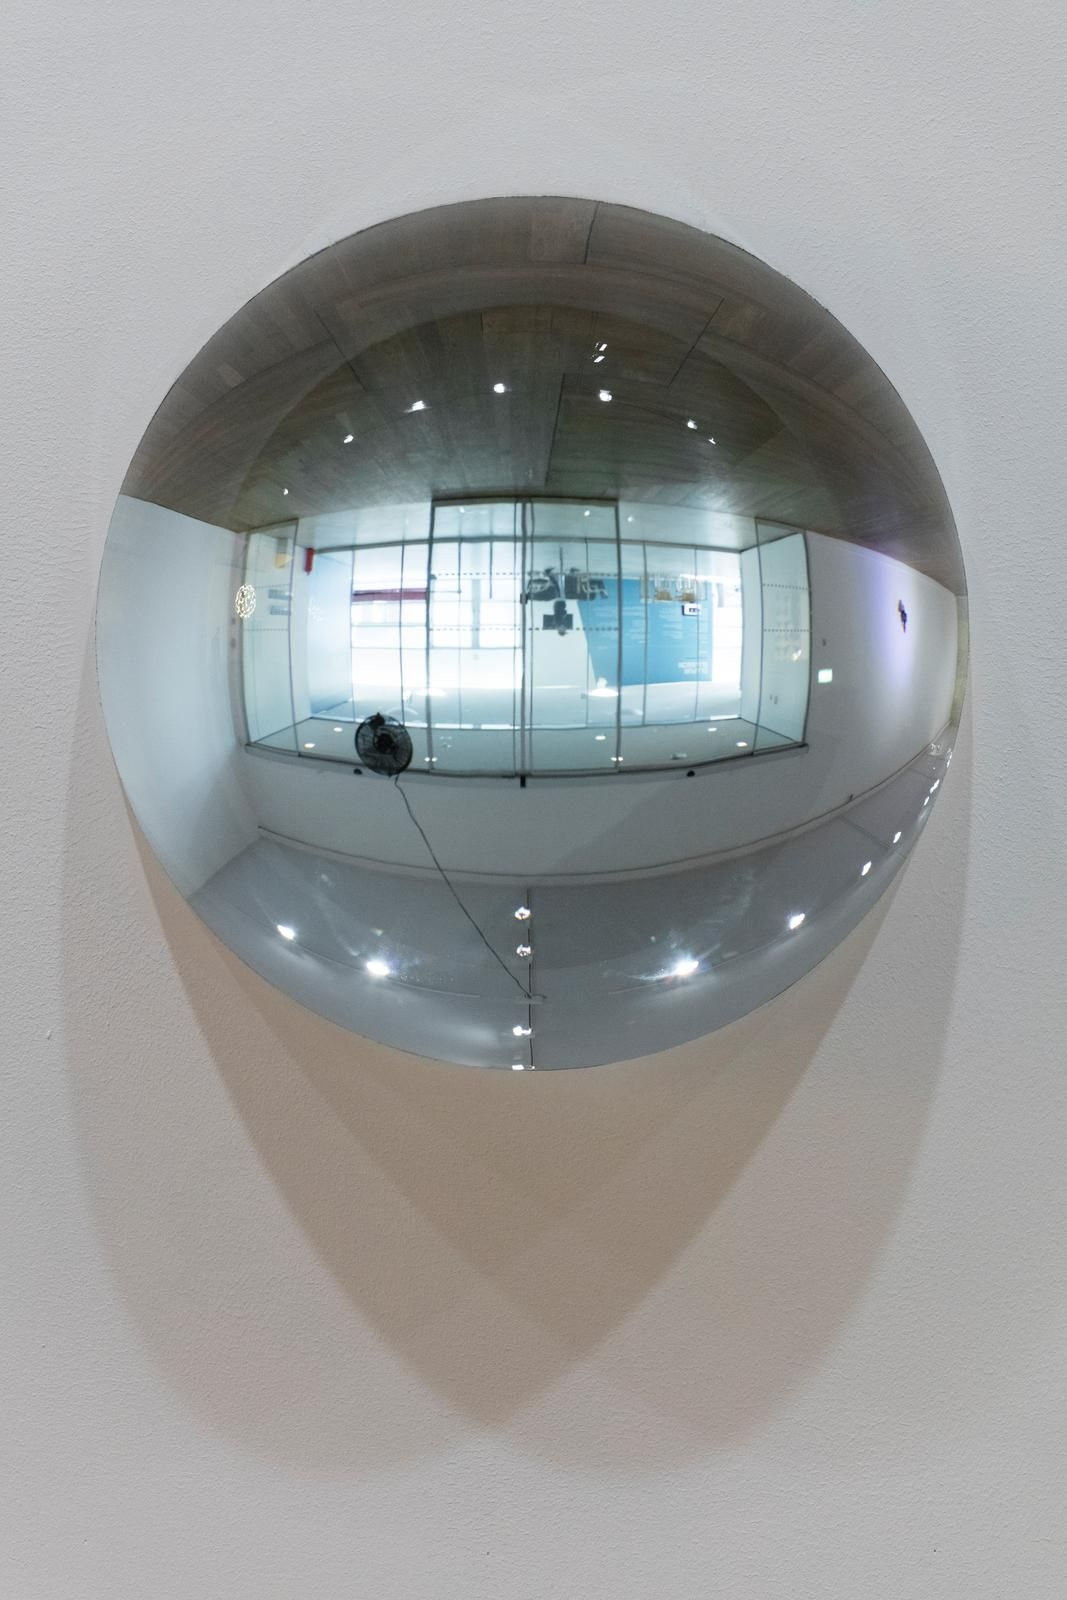 The seeing space • Artwork • Studio Olafur Eliasson